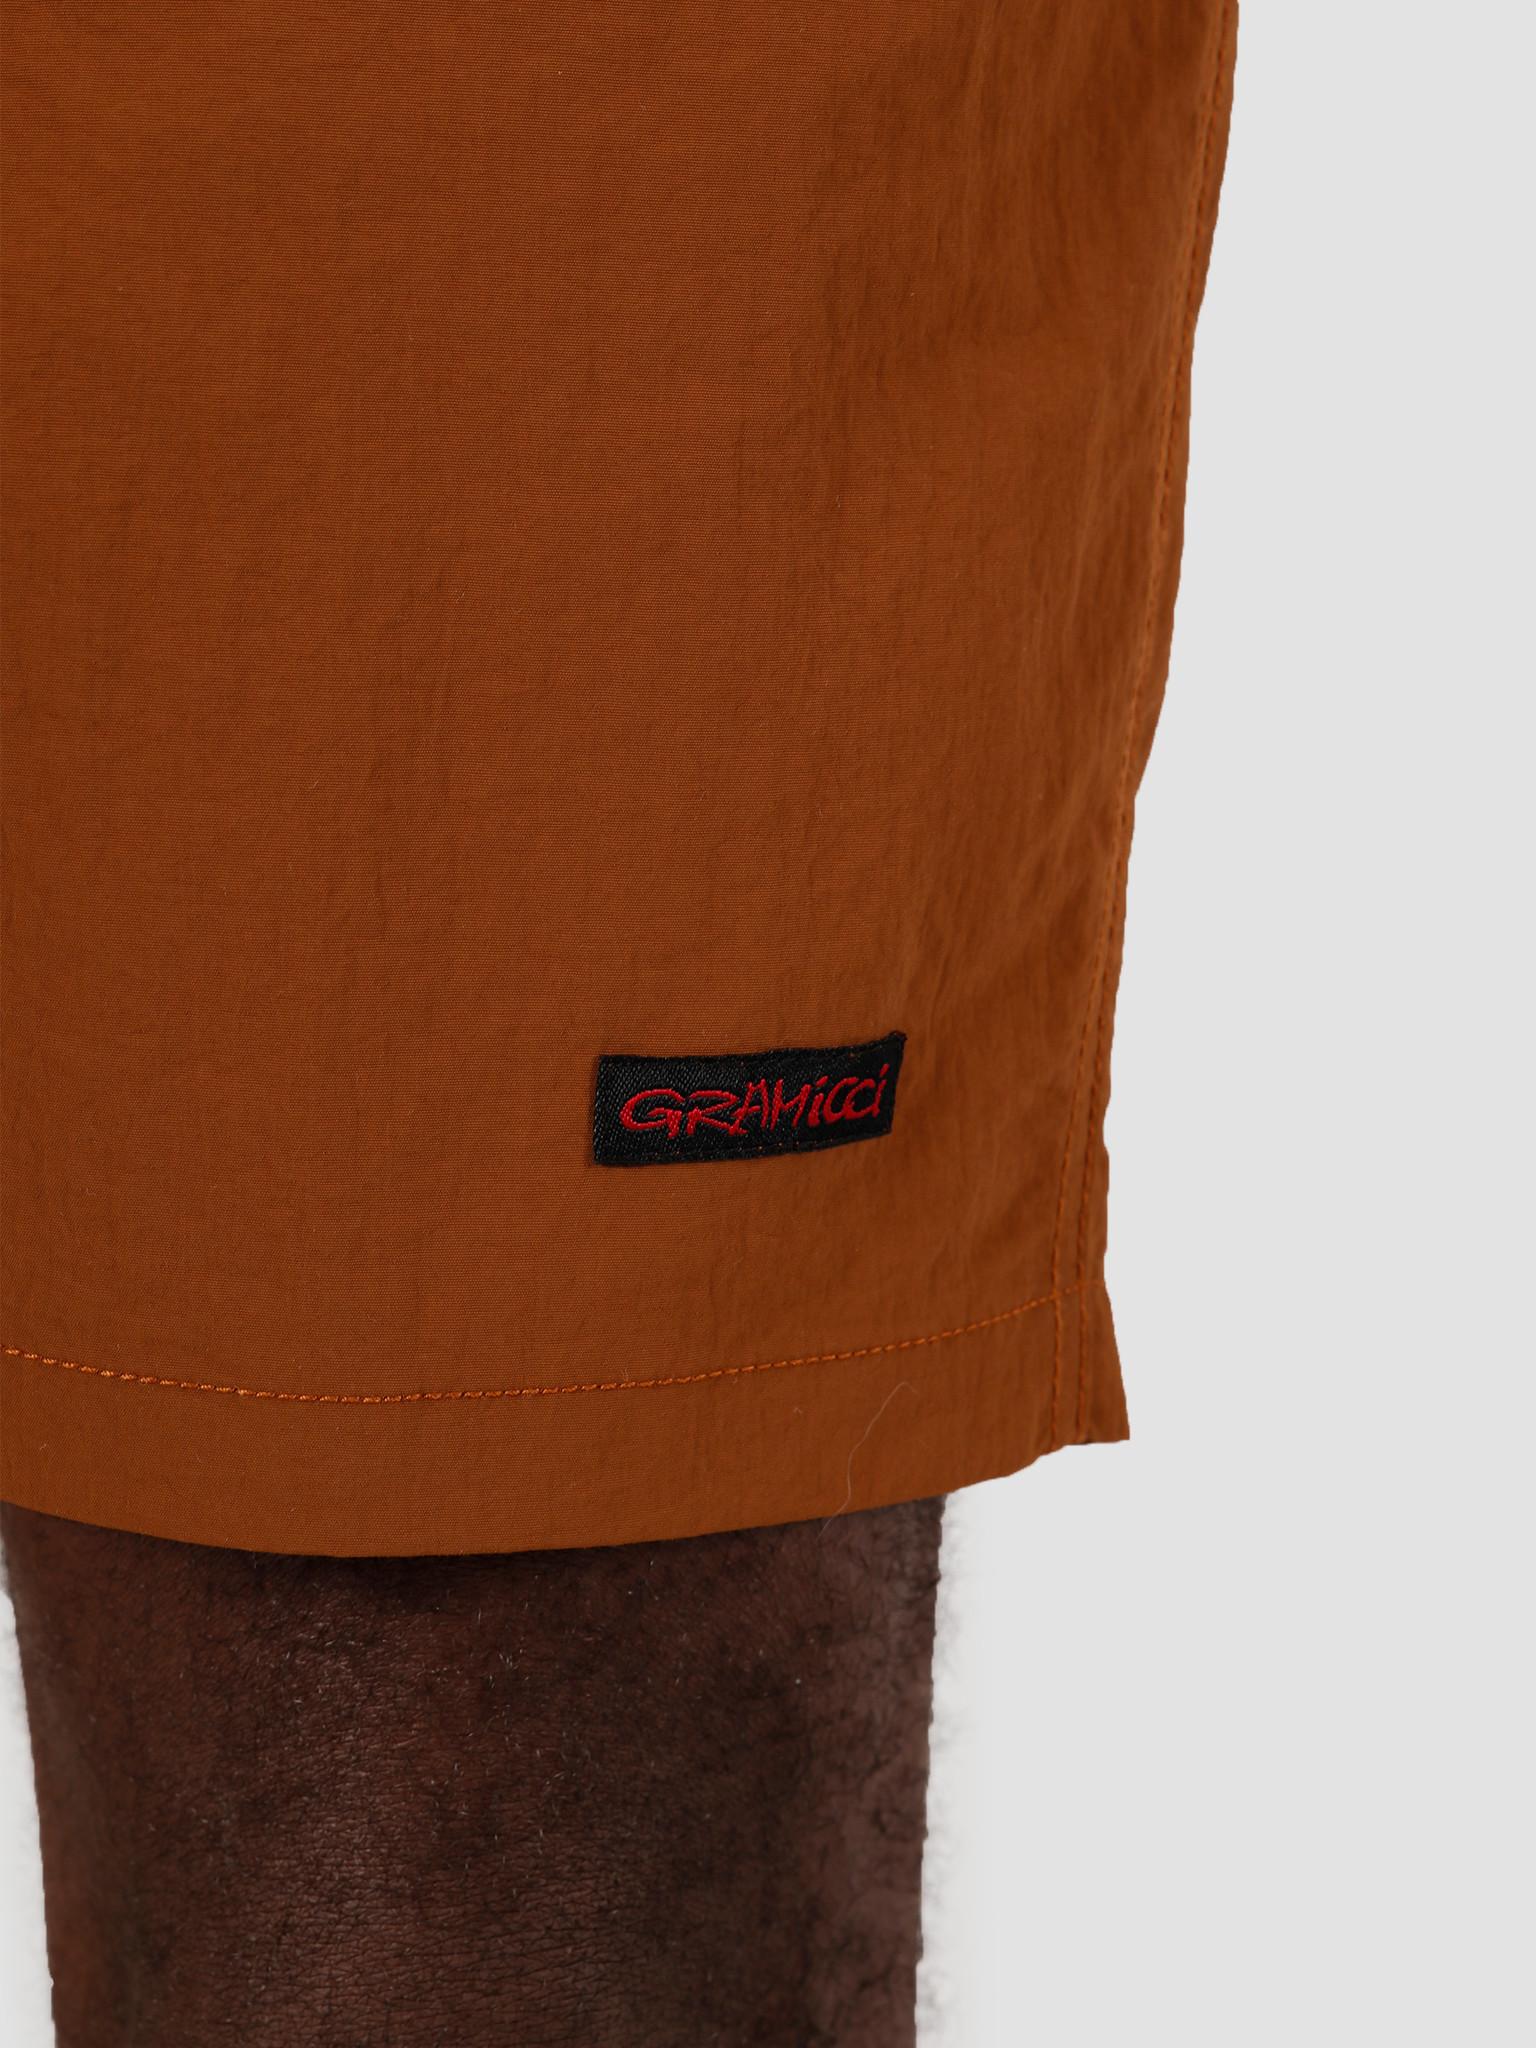 Gramicci Gramicci Shell Packable Shorts Mocha GUP-20S037